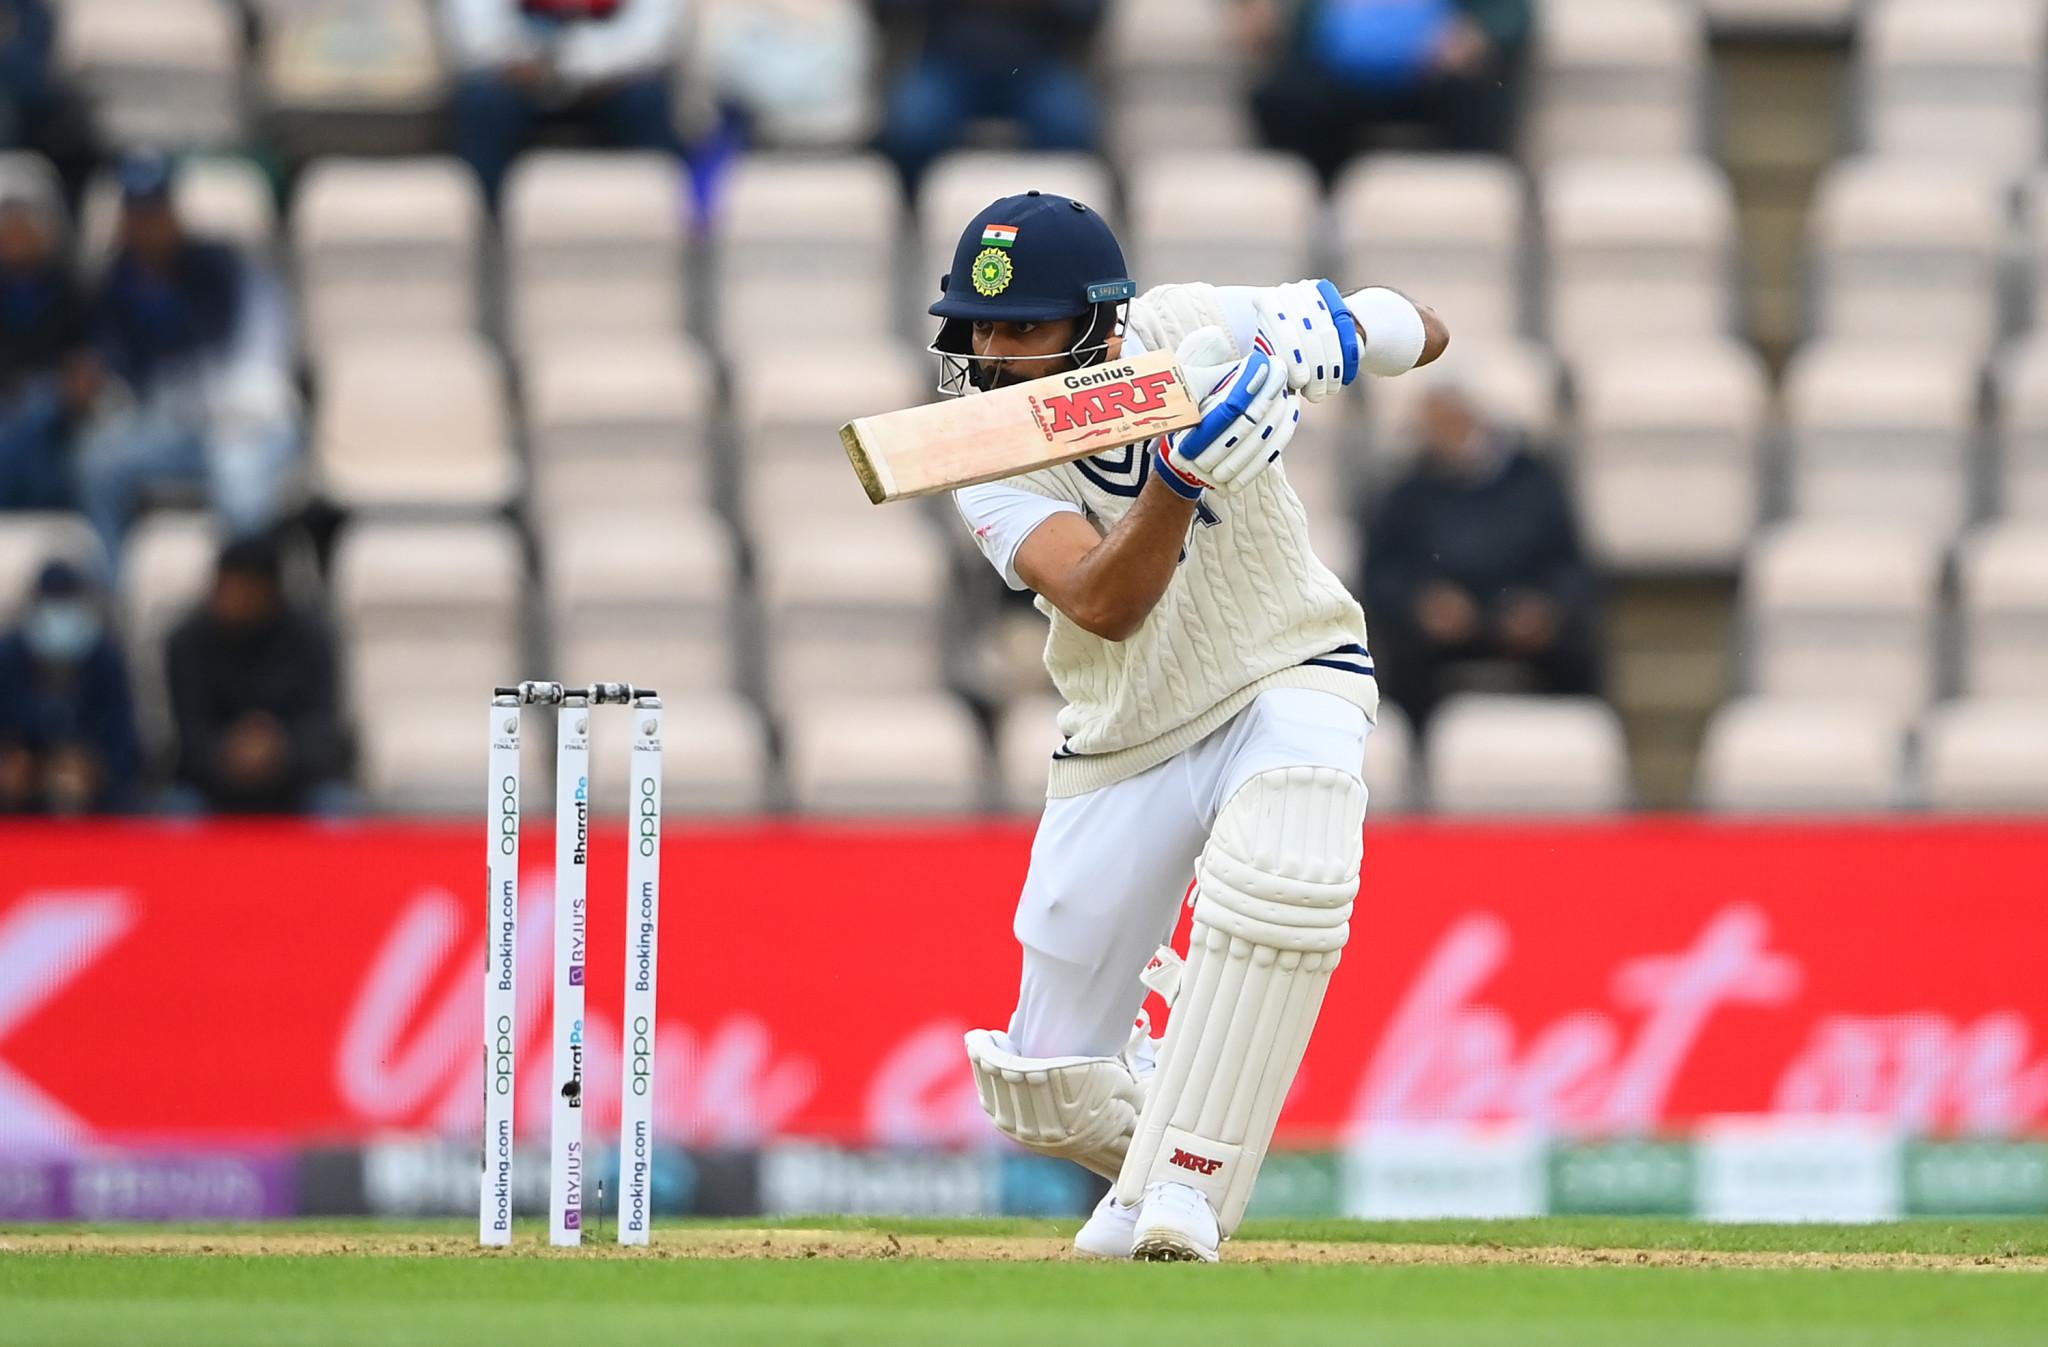 Kohli unbeaten as India edge stop-start day in World Test Championship final